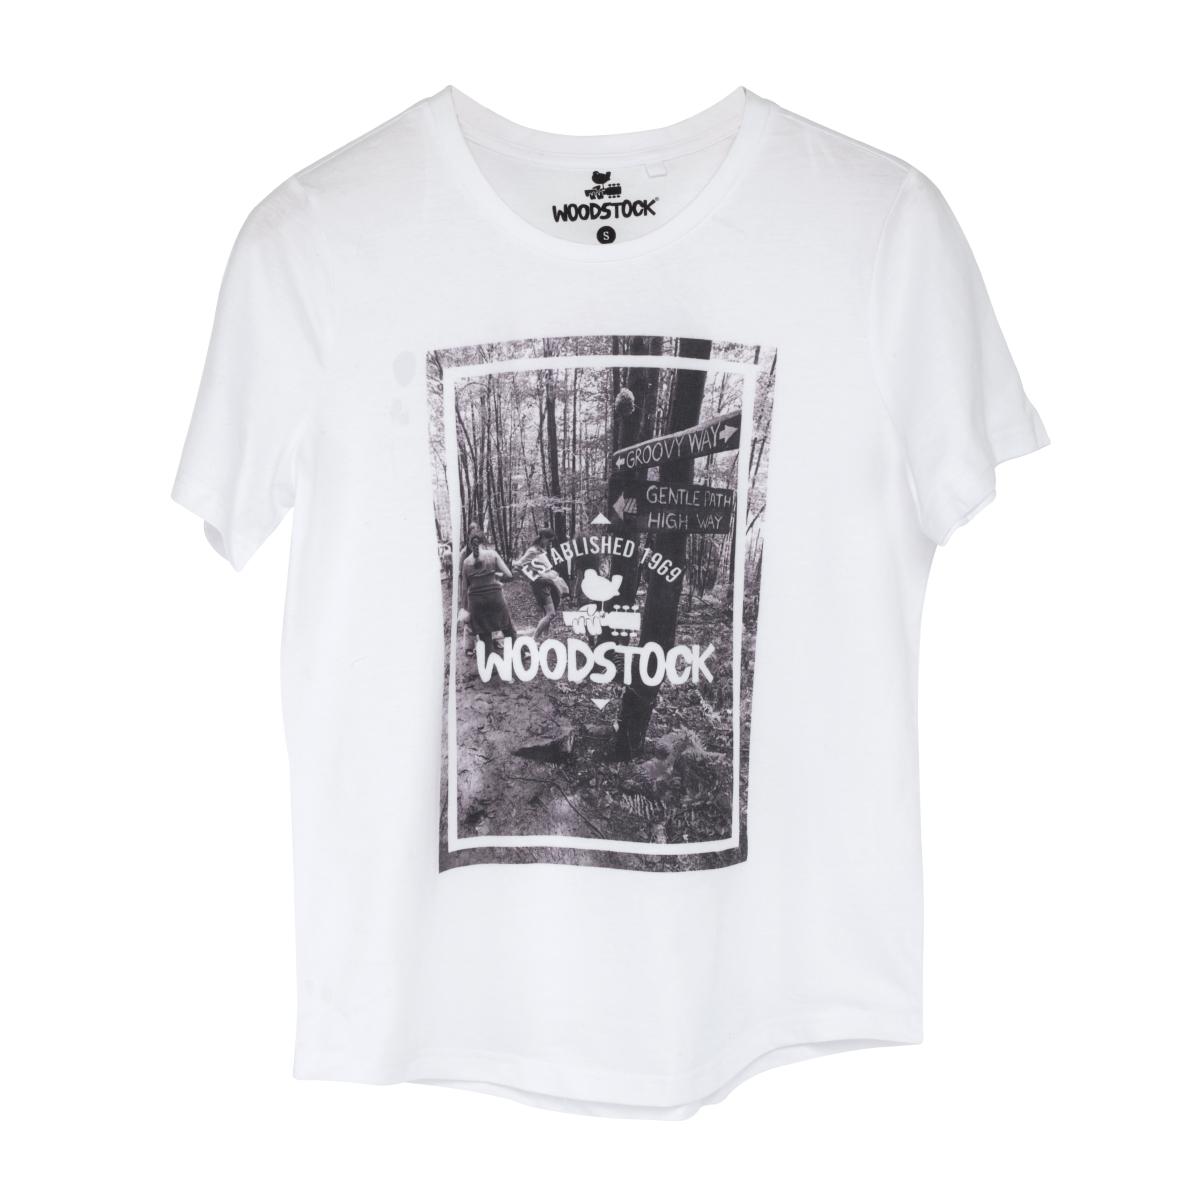 Woodstock 1969 Groovy Way Photo White T-Shirt